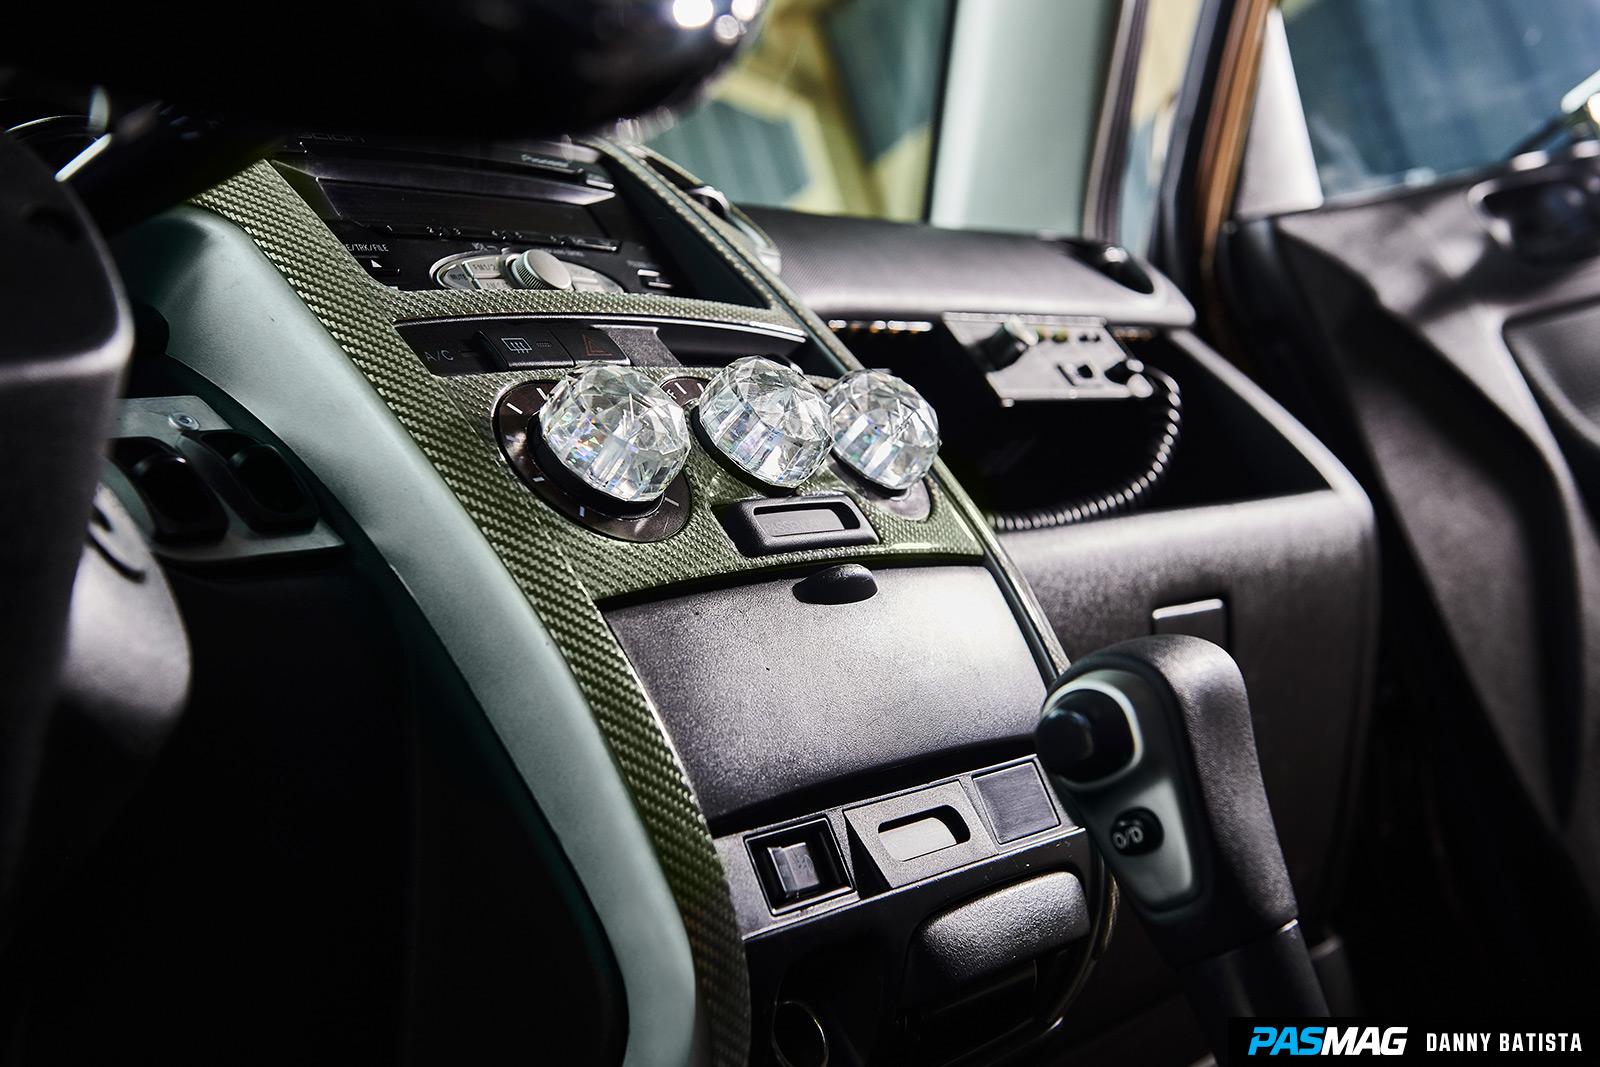 Pasmag Performance Auto And Sound Double Take Patrick Machs Injen Focus Fuse Box Cover Pas Tbglive Mach 2006 Scion Xb 9